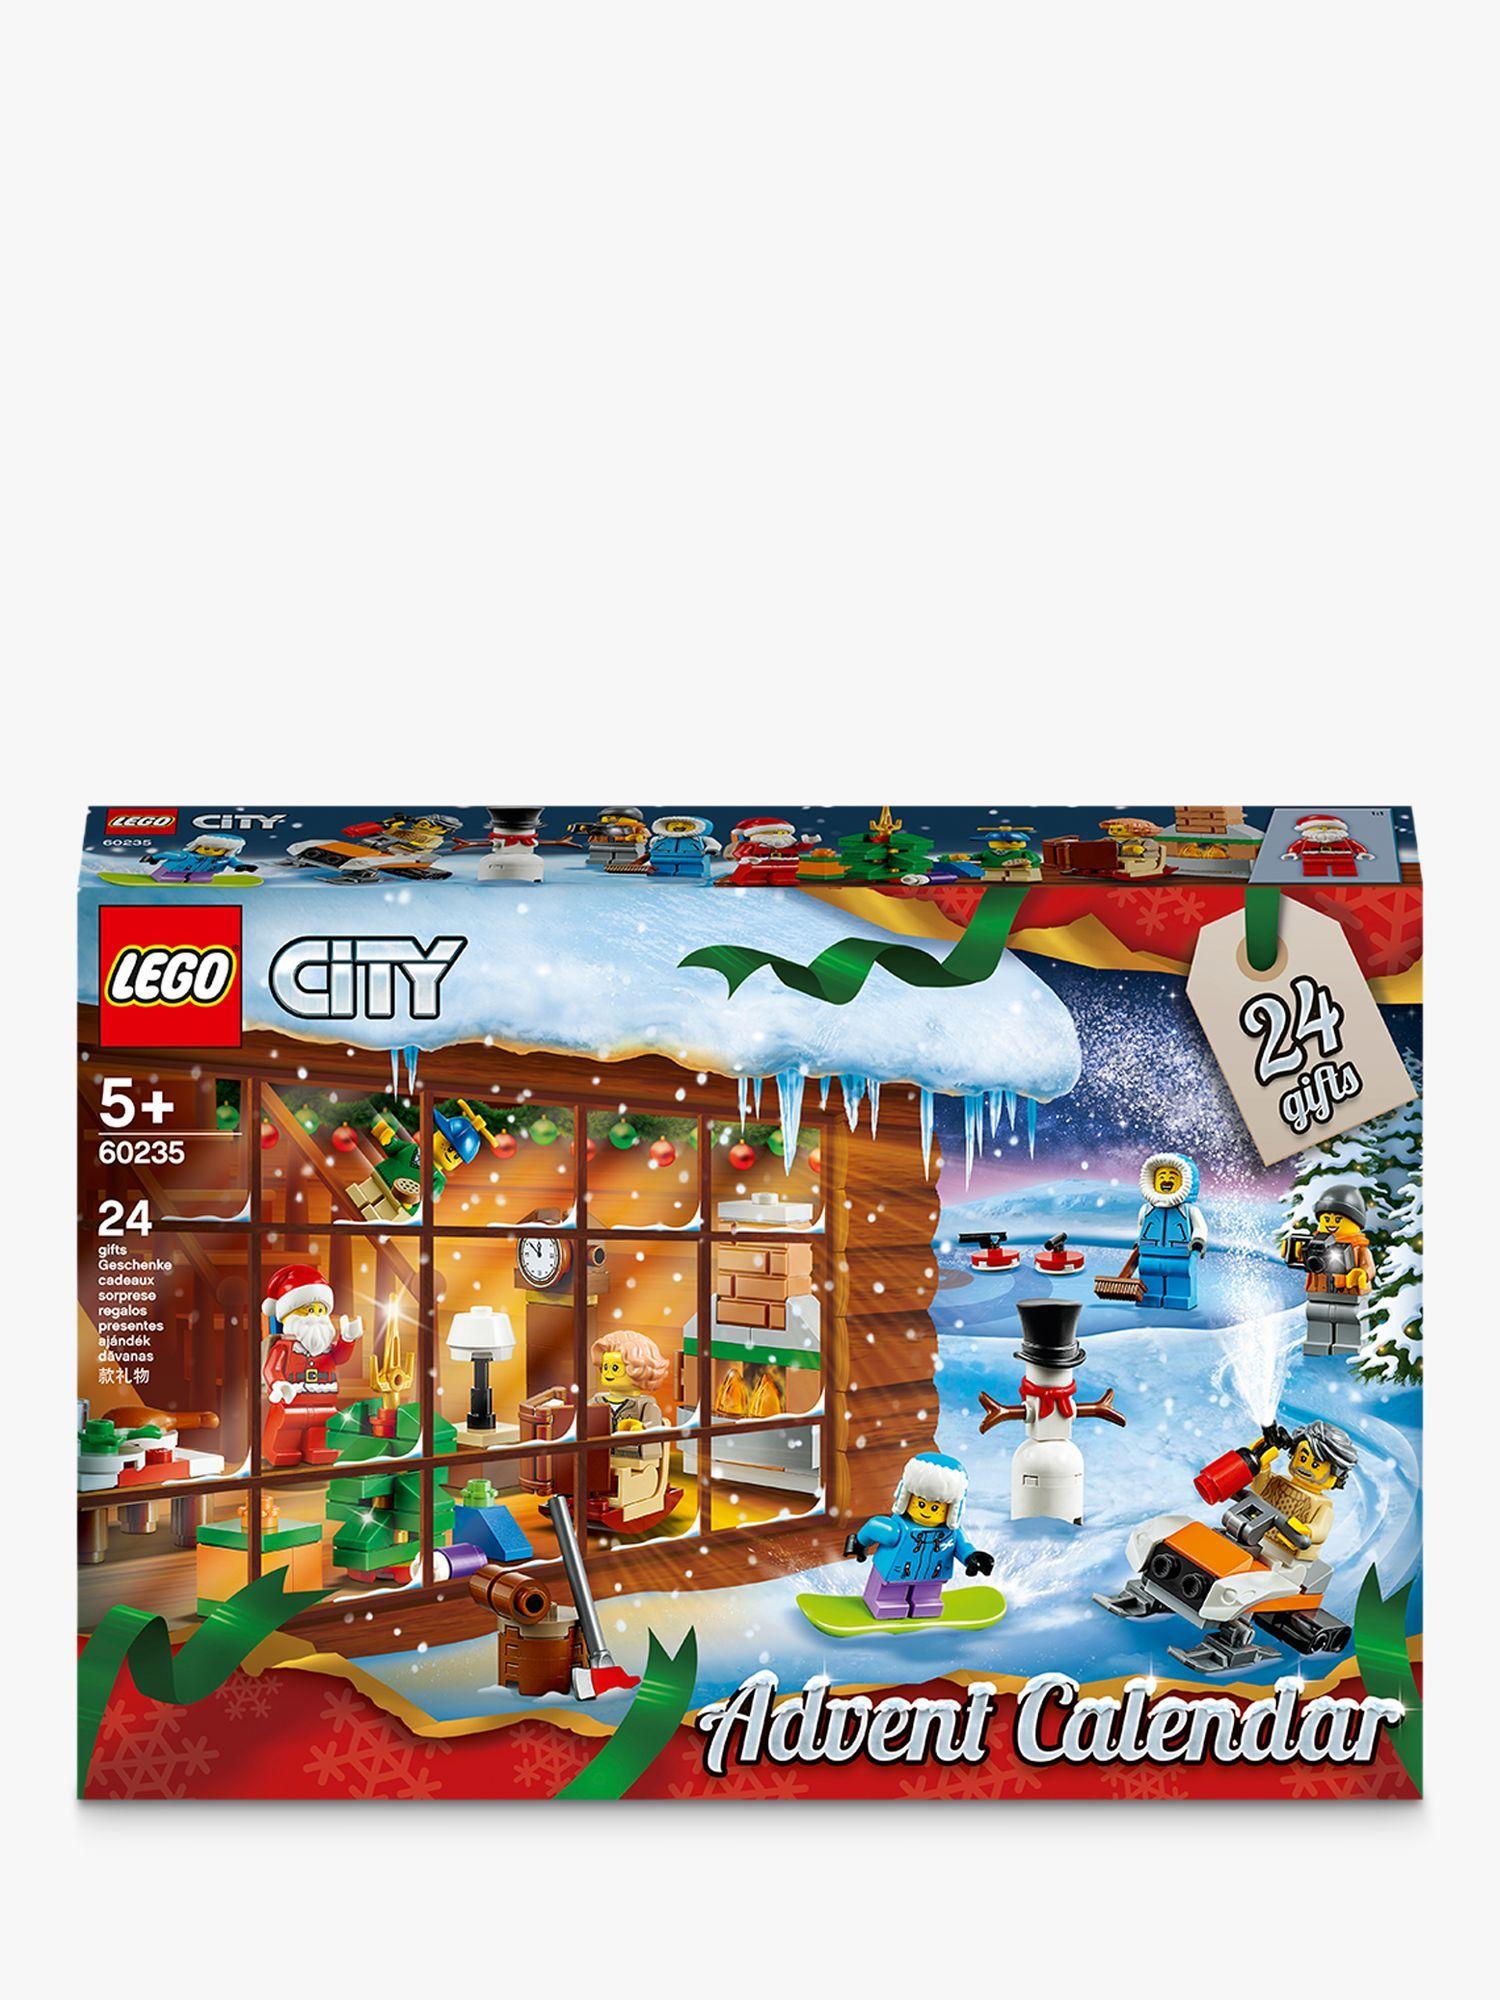 Lego City 60235 Advent Calendar Lego City Advent Calendar